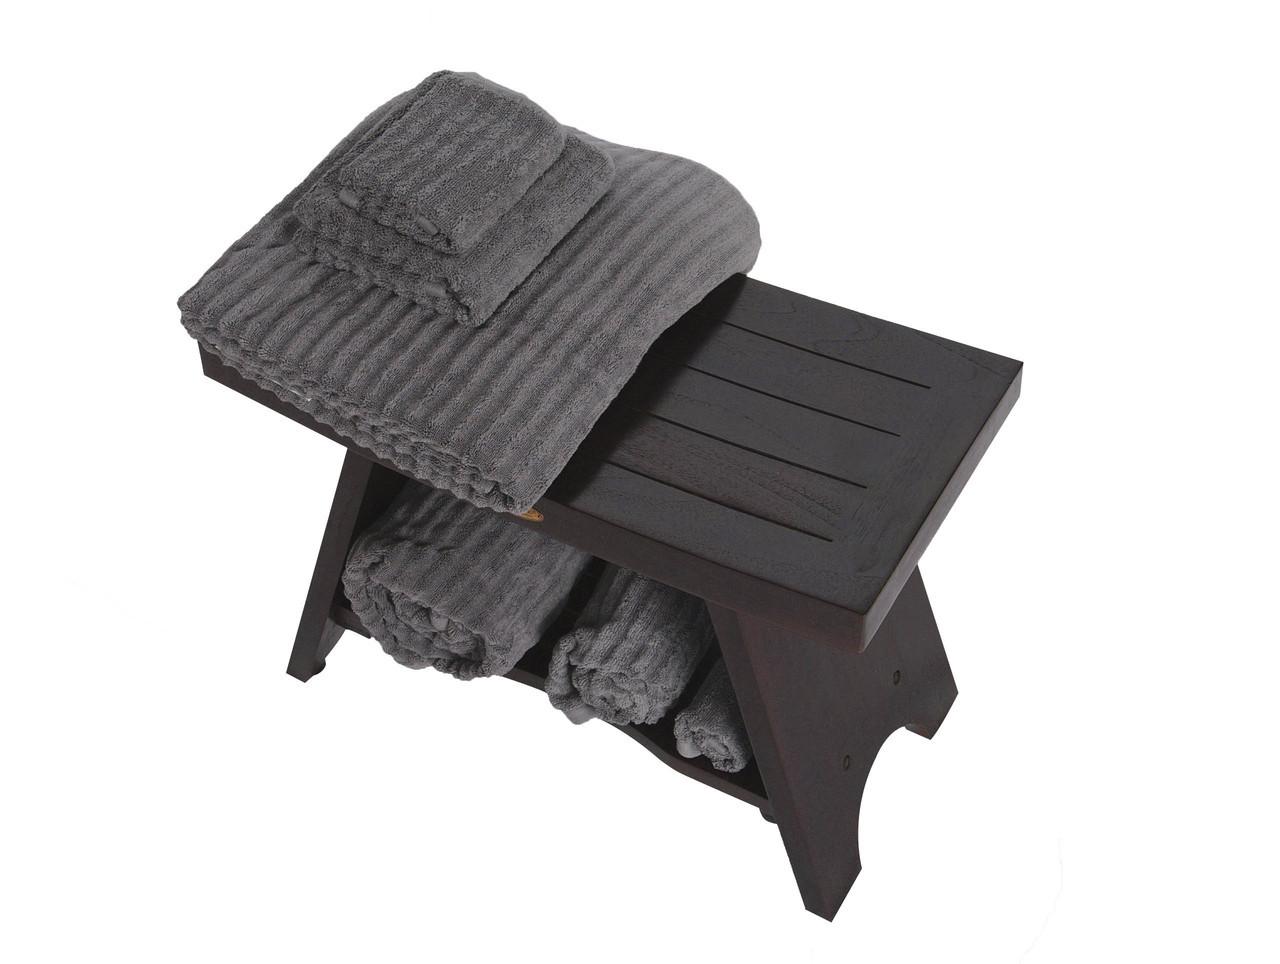 "DecoTeak Serenity 24"" Teak Wood Shower Bench with Shelf in Woodland Brown Finish"